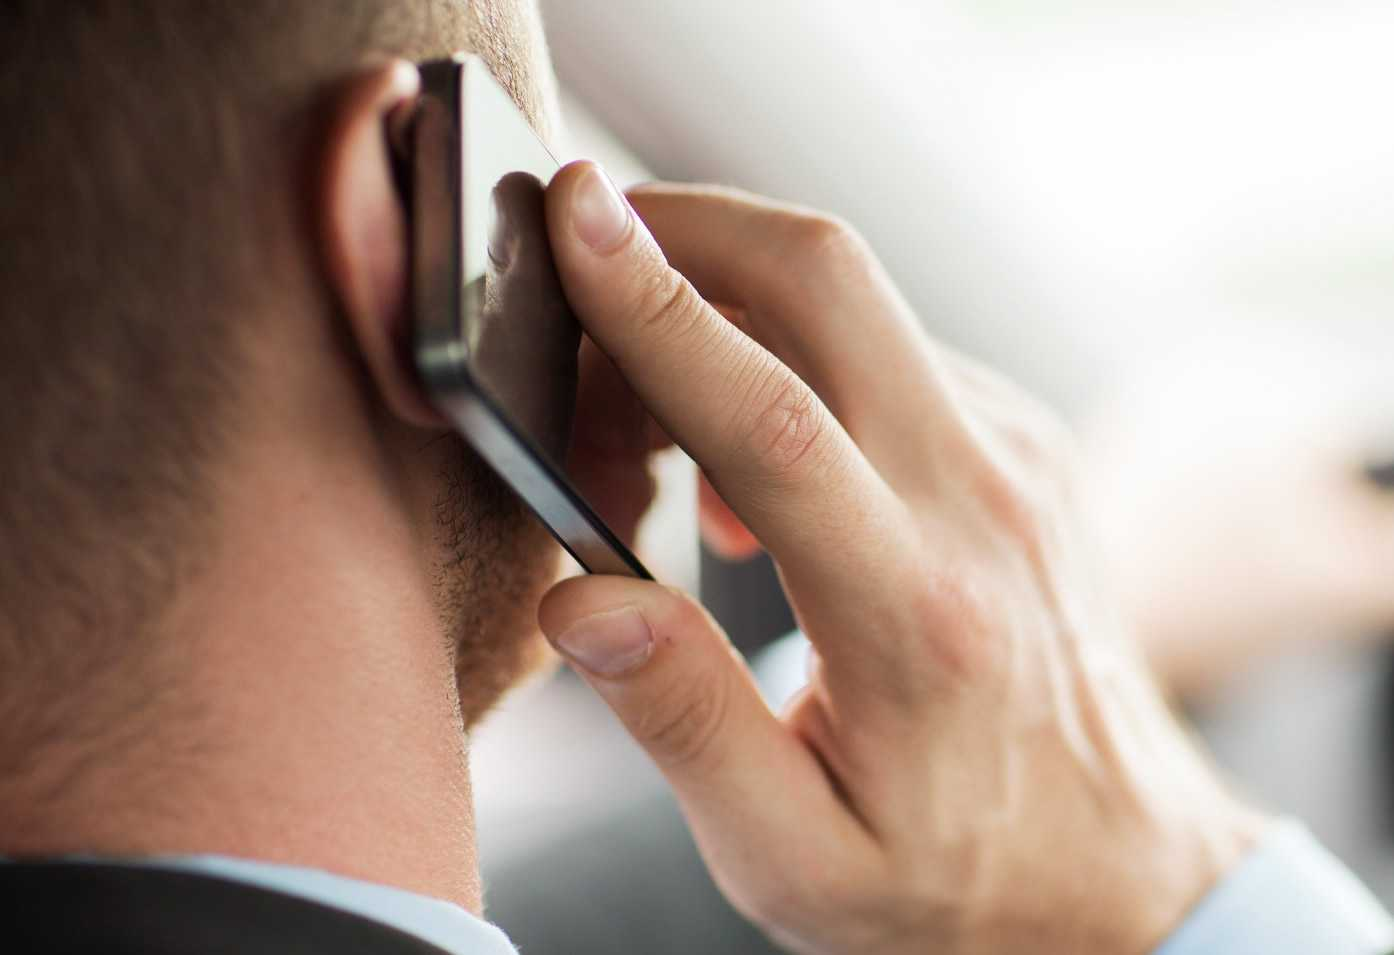 Risc crescut de TUMORI CEREBRALE pentru cei care vorbesc frecvent la TELEFONUL MOBIL